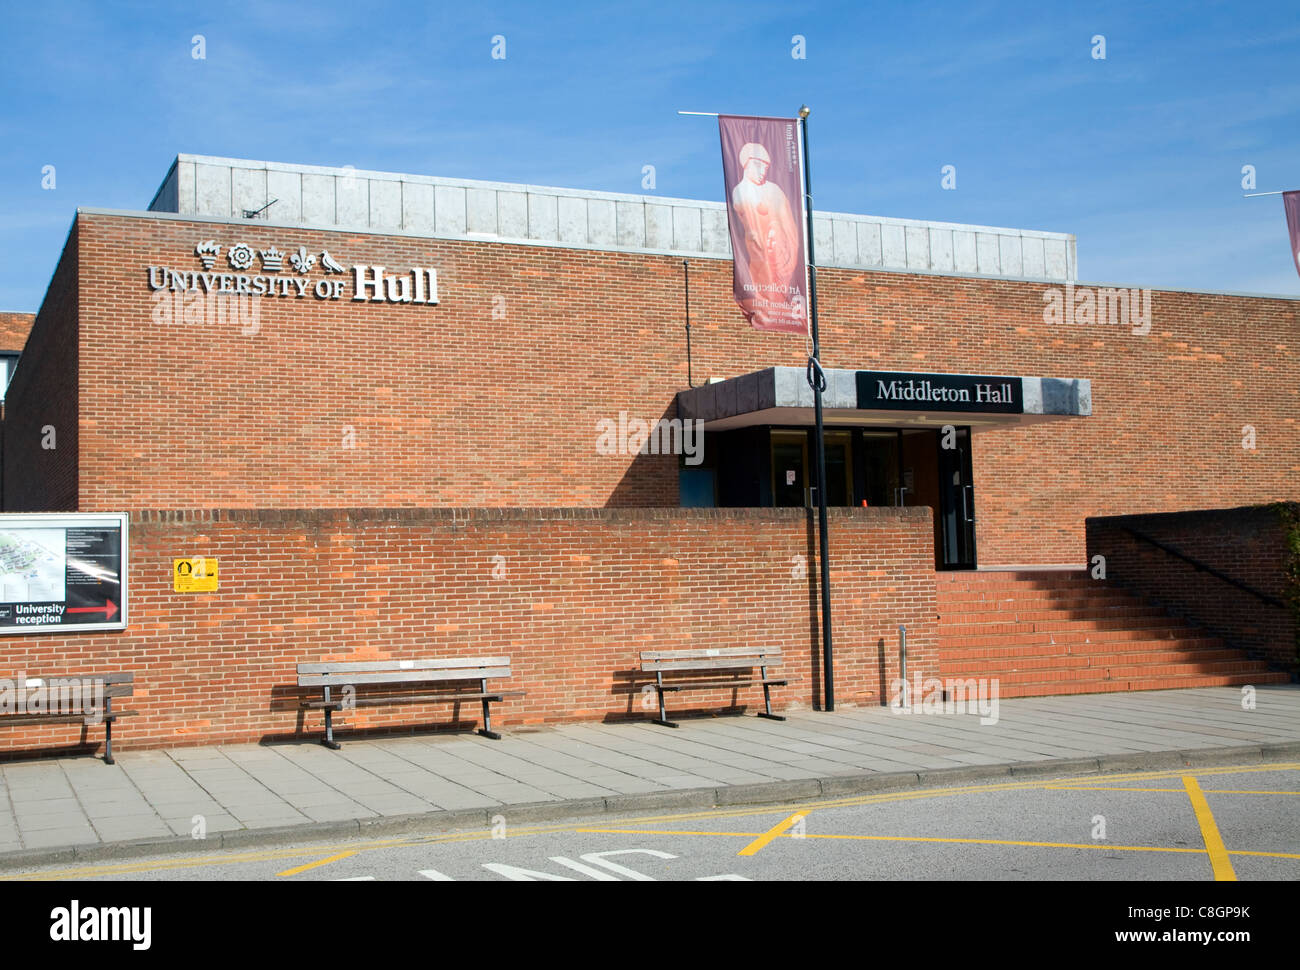 Middleton Hall, University of Hull, Hull, Yorkshire, England - Stock Image